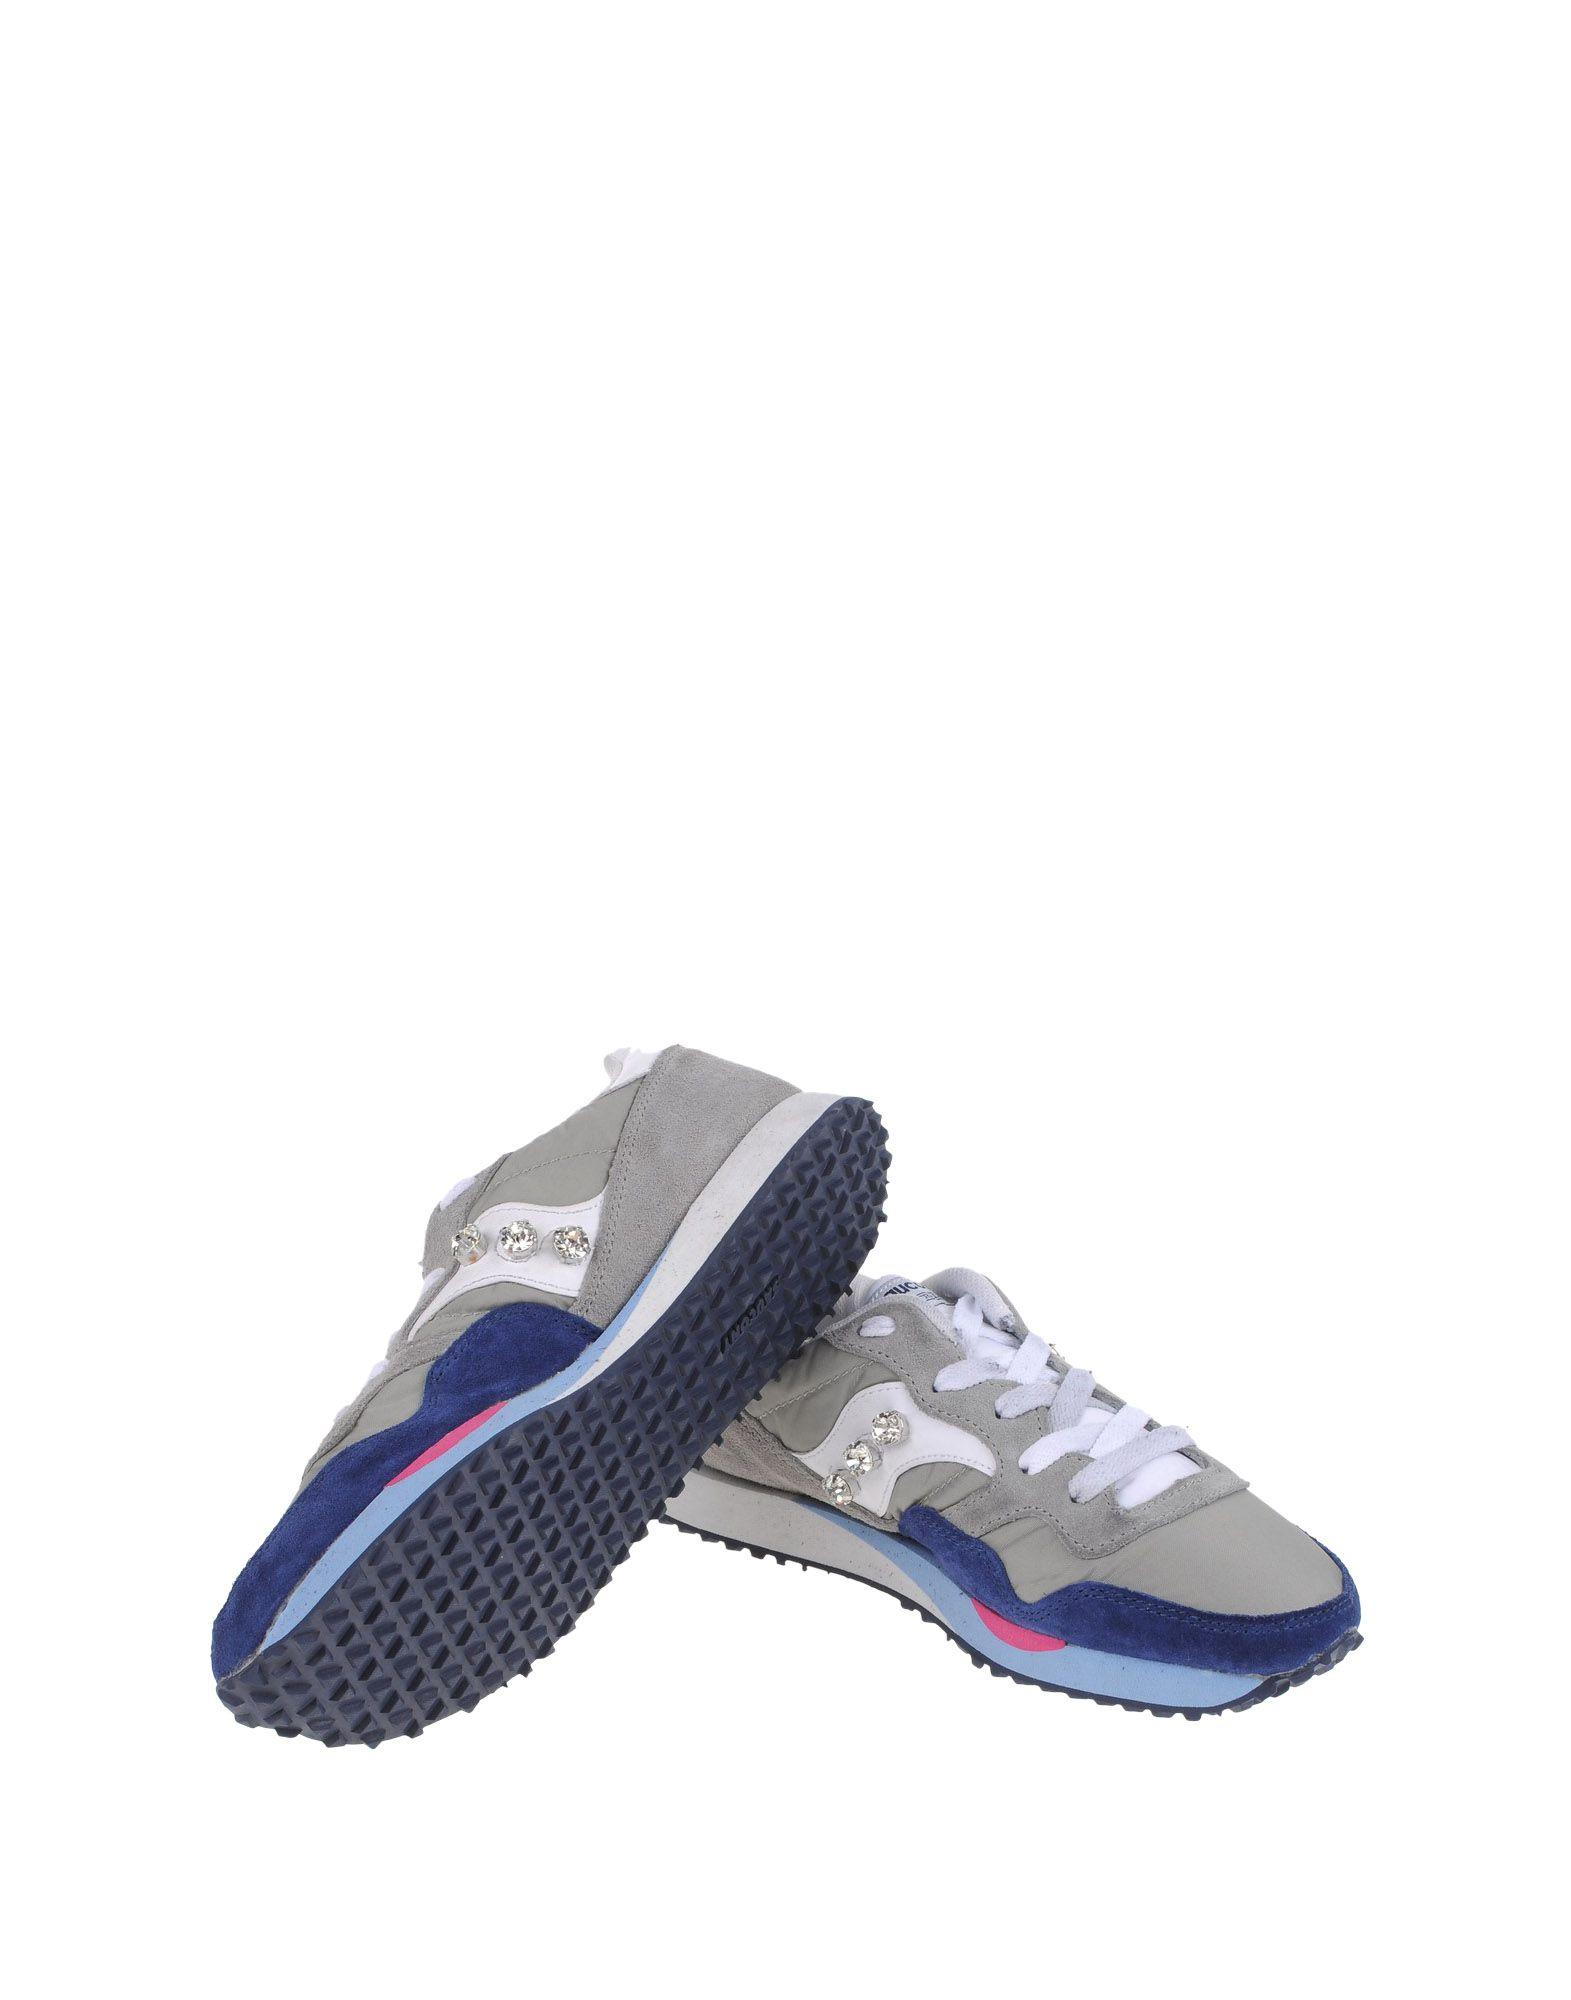 Sneakers Saucony Dxn Trainer Jewel Lmt Ed. - Femme - Sneakers Saucony sur